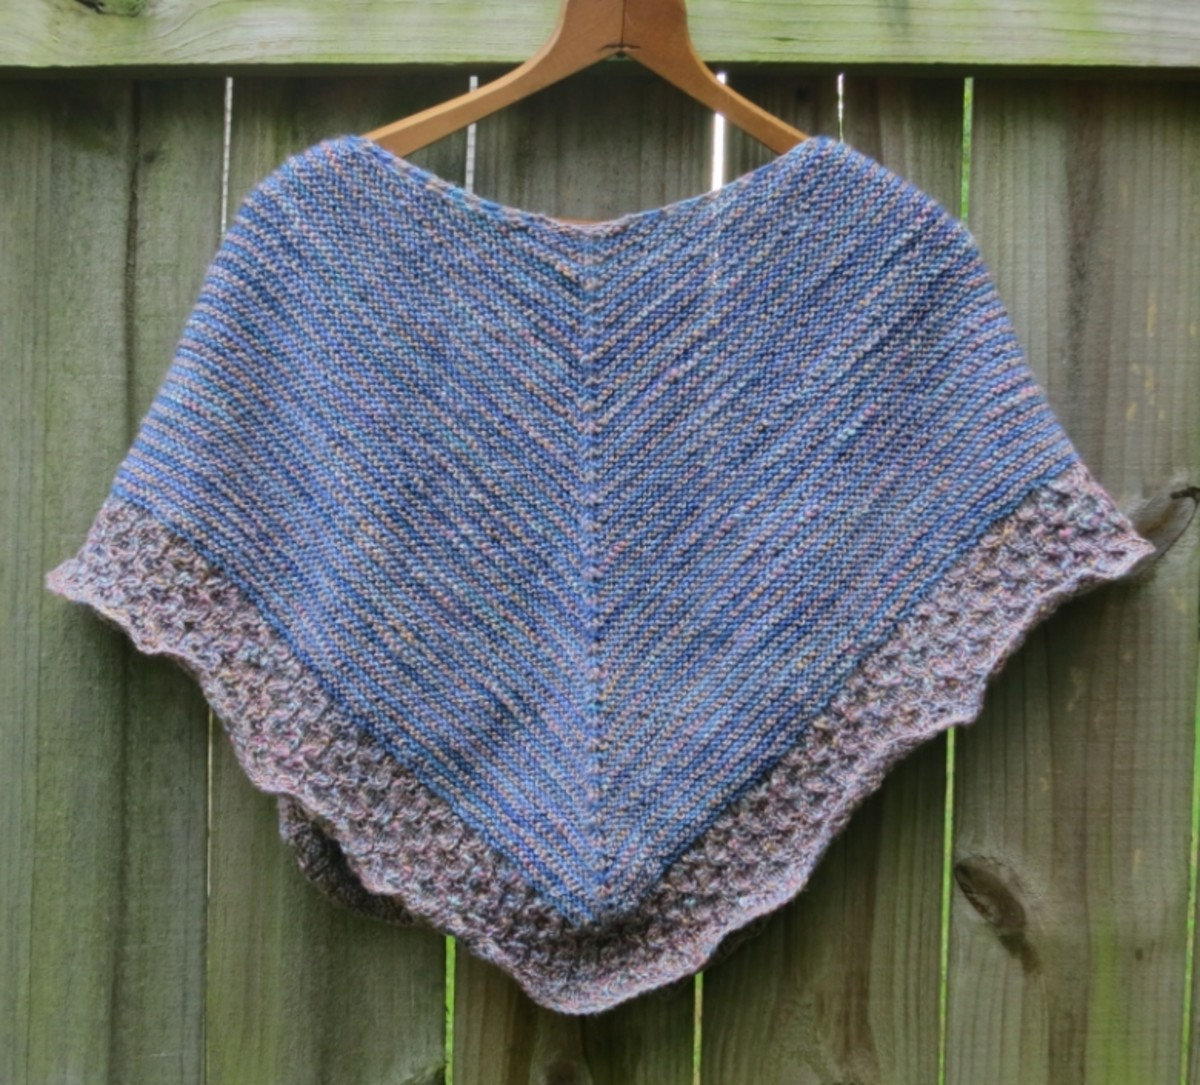 Textured Knitting Patterns : Free knitting pattern lightweight textured shawl